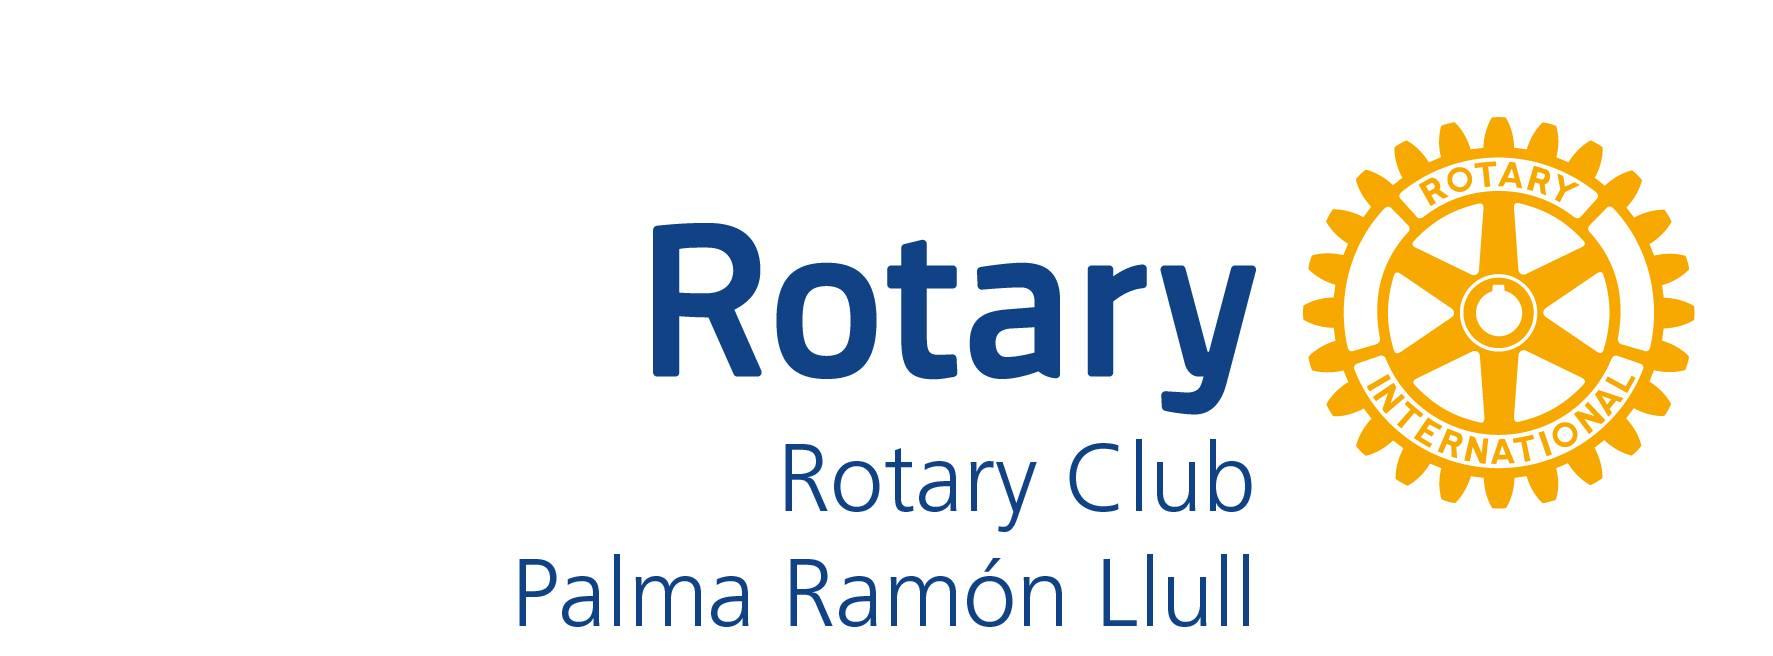 015 rotary